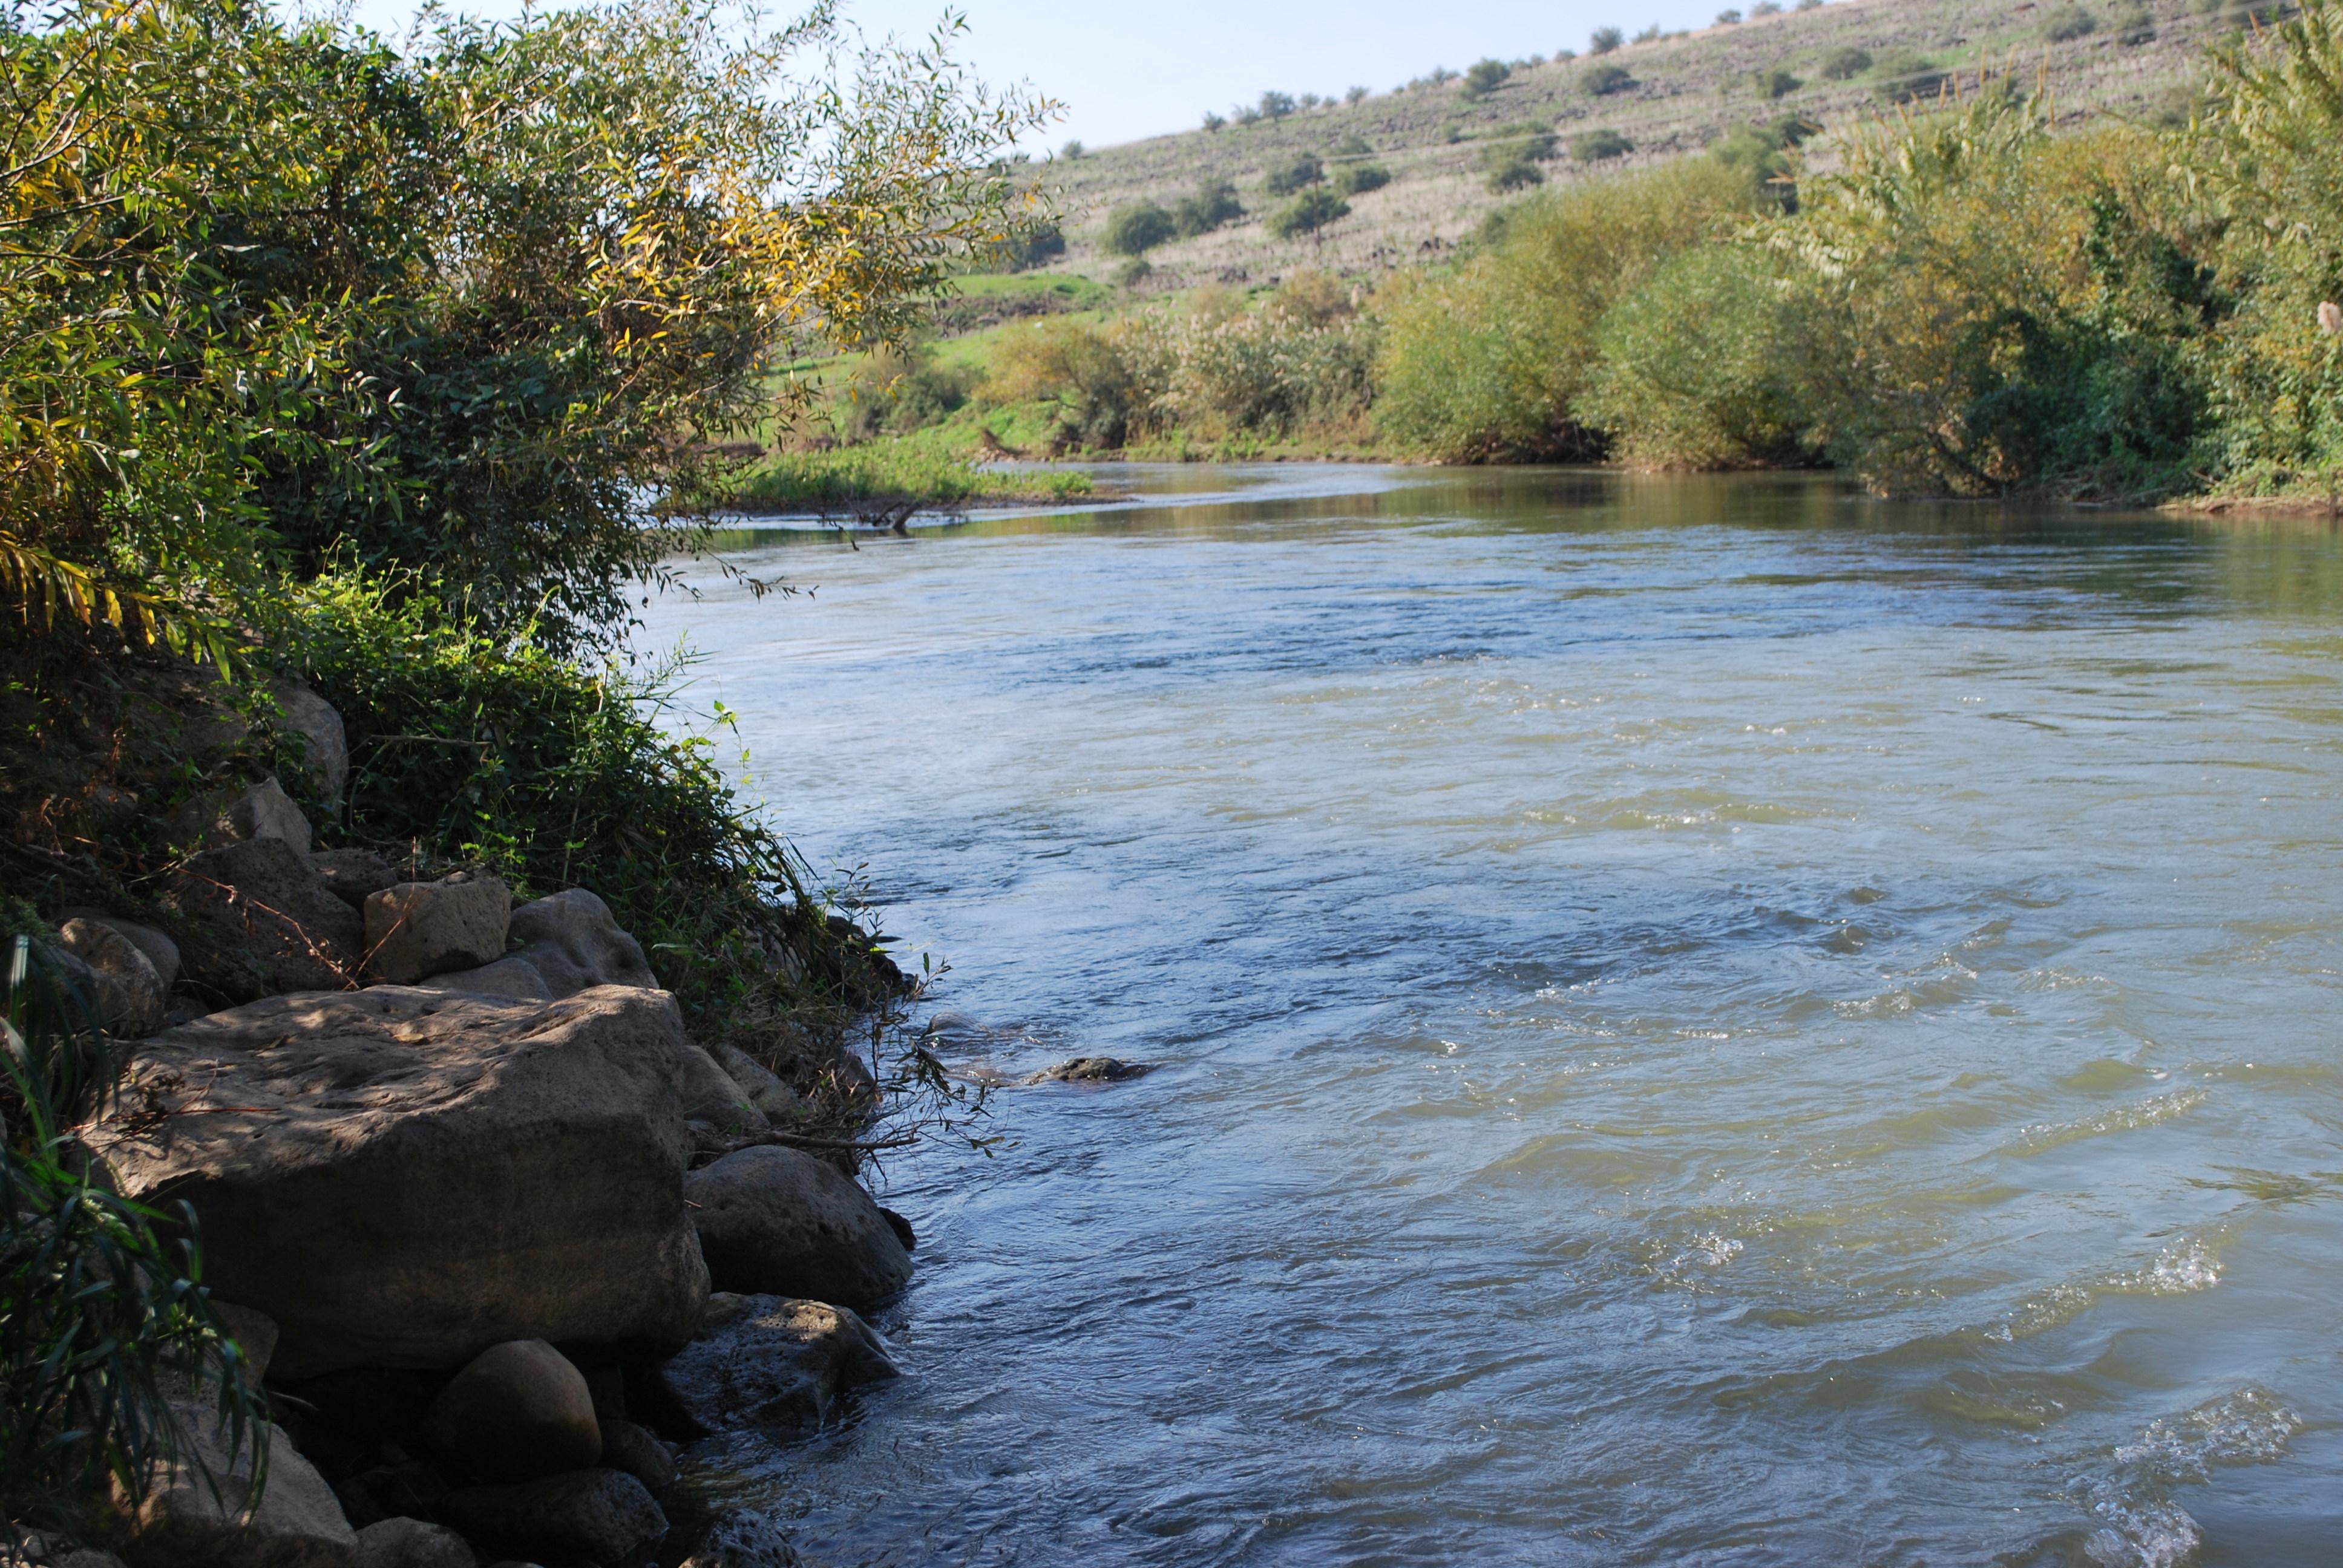 File:Jordan River (5418351509).jpg - Wikimedia Commons